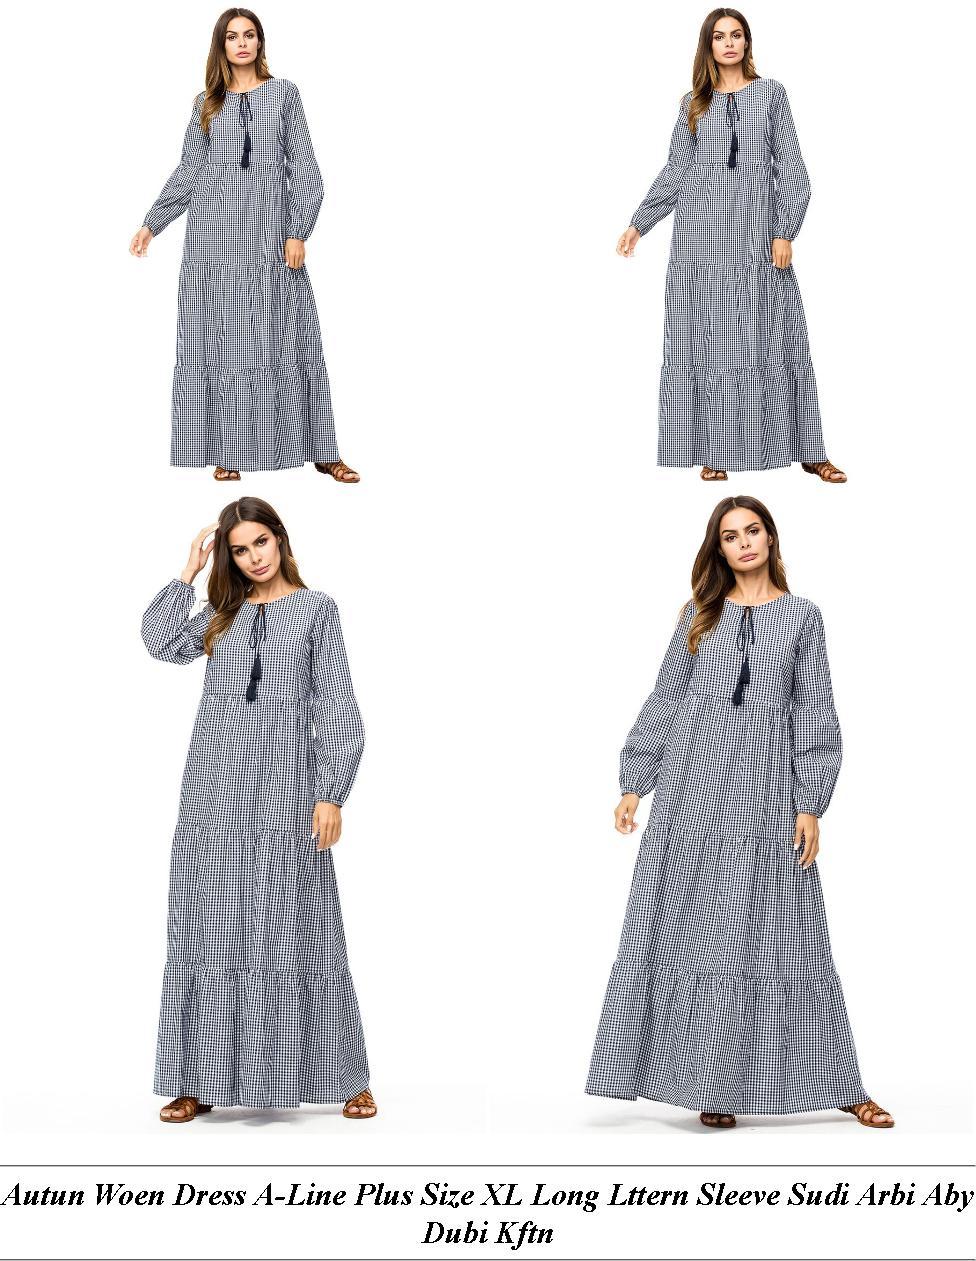 Lack Chiffon Dress Plus Size - For Sale Tvr Sagaris - Silk Dress